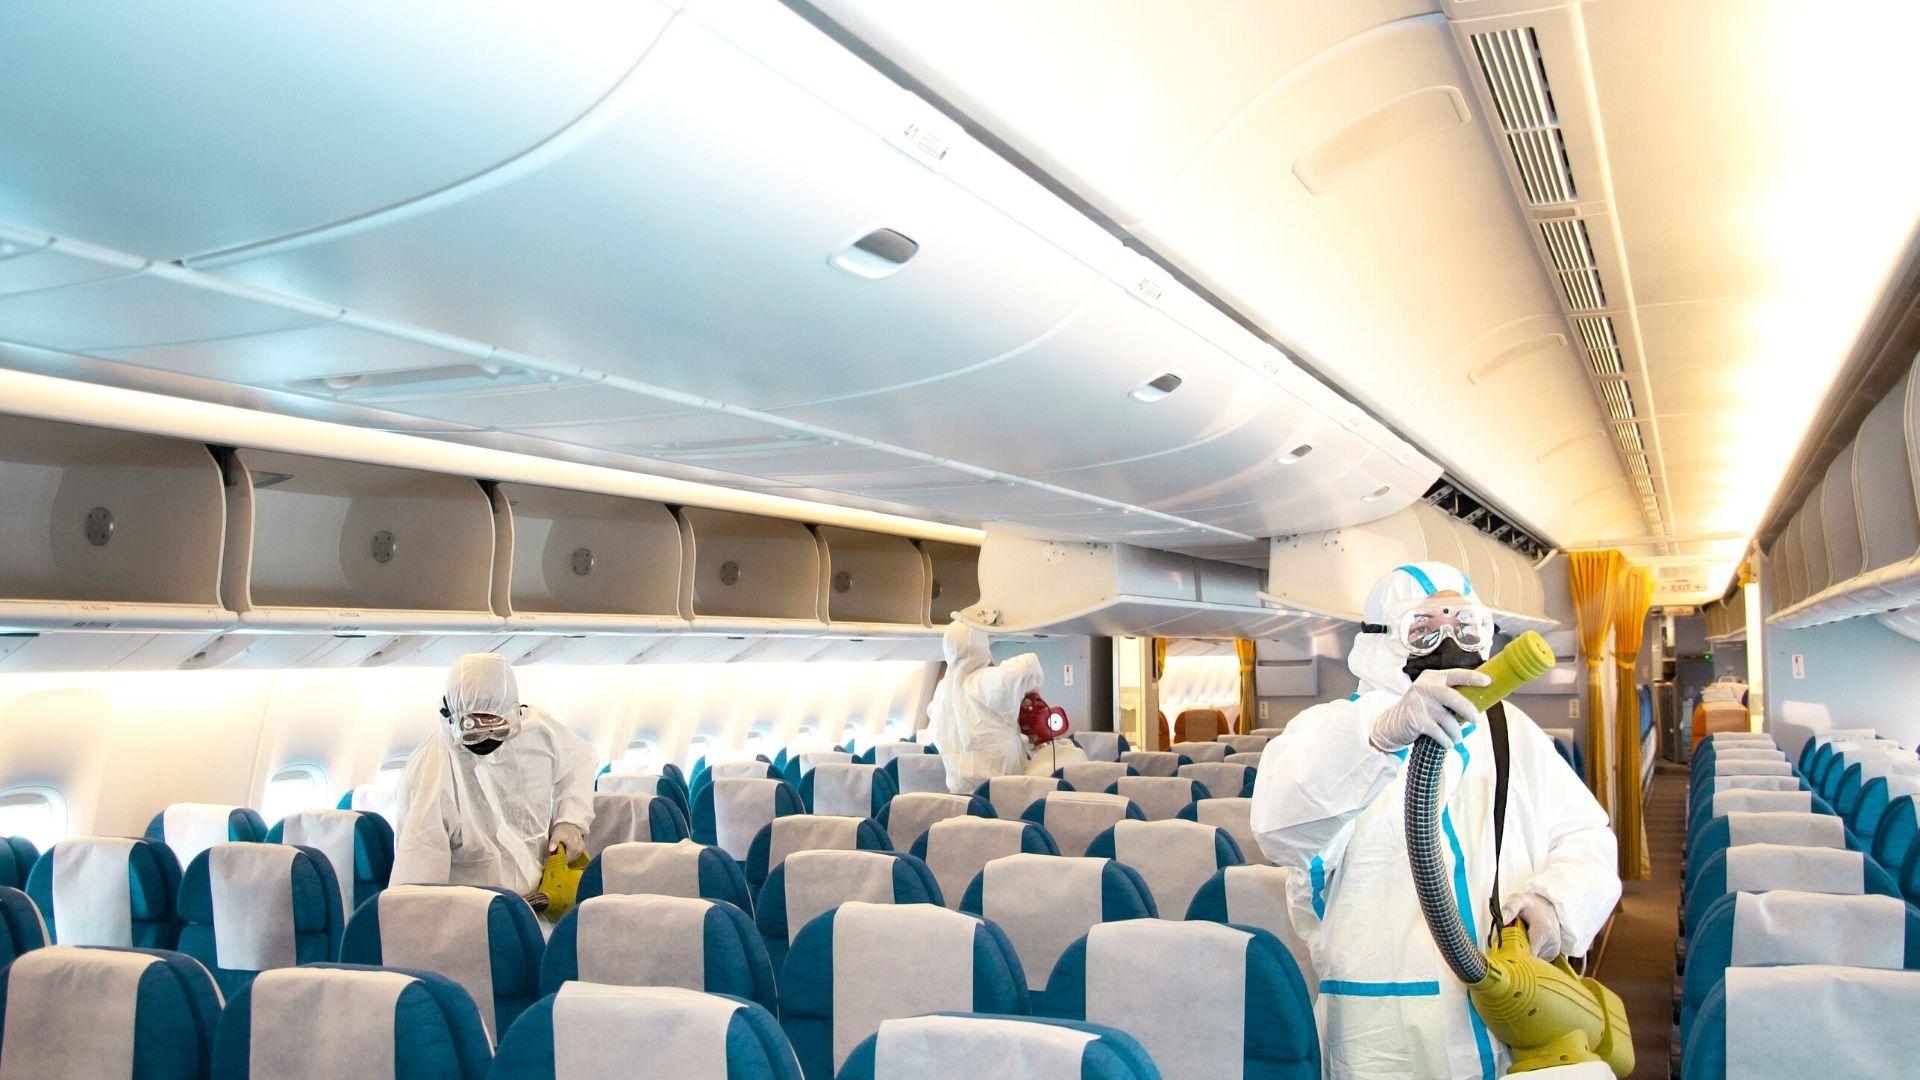 Sanitizing plane covid19 - 疫情期间搭飞机如何注意卫生、保护自己?